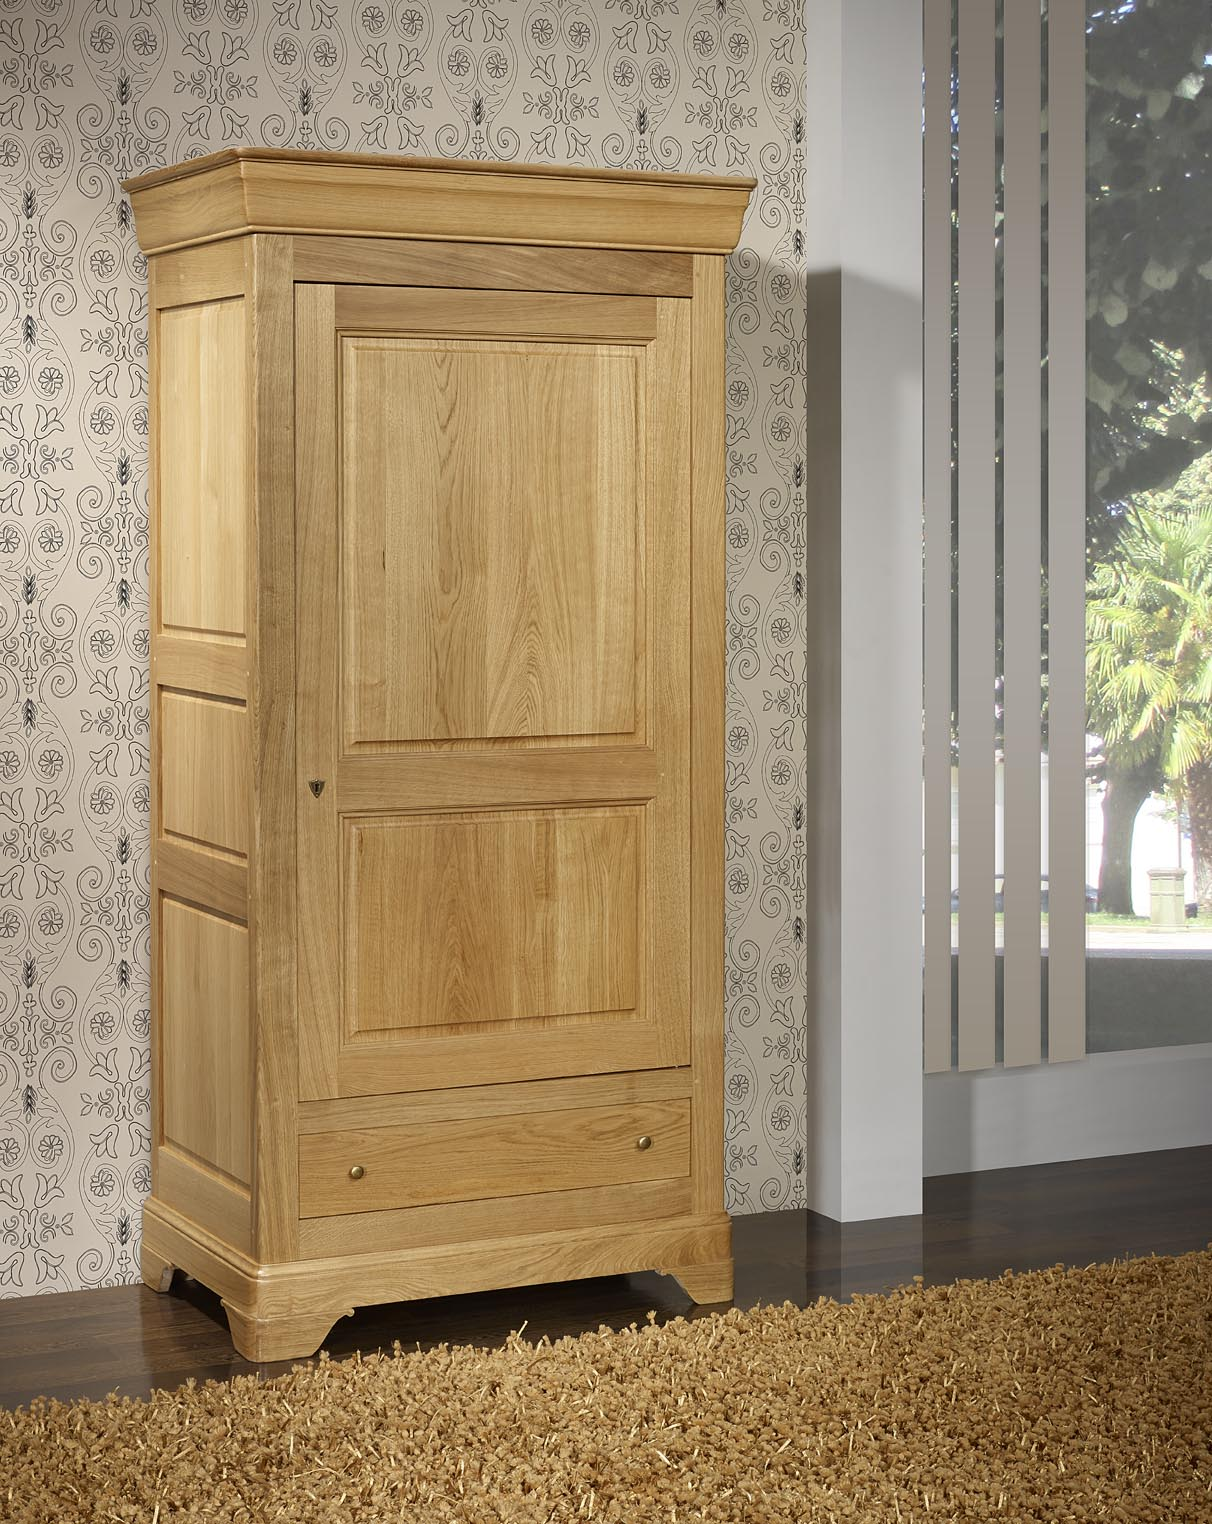 Bonneti re 1 porte 1 tiroir en ch ne massif de style louis for Meuble en chene